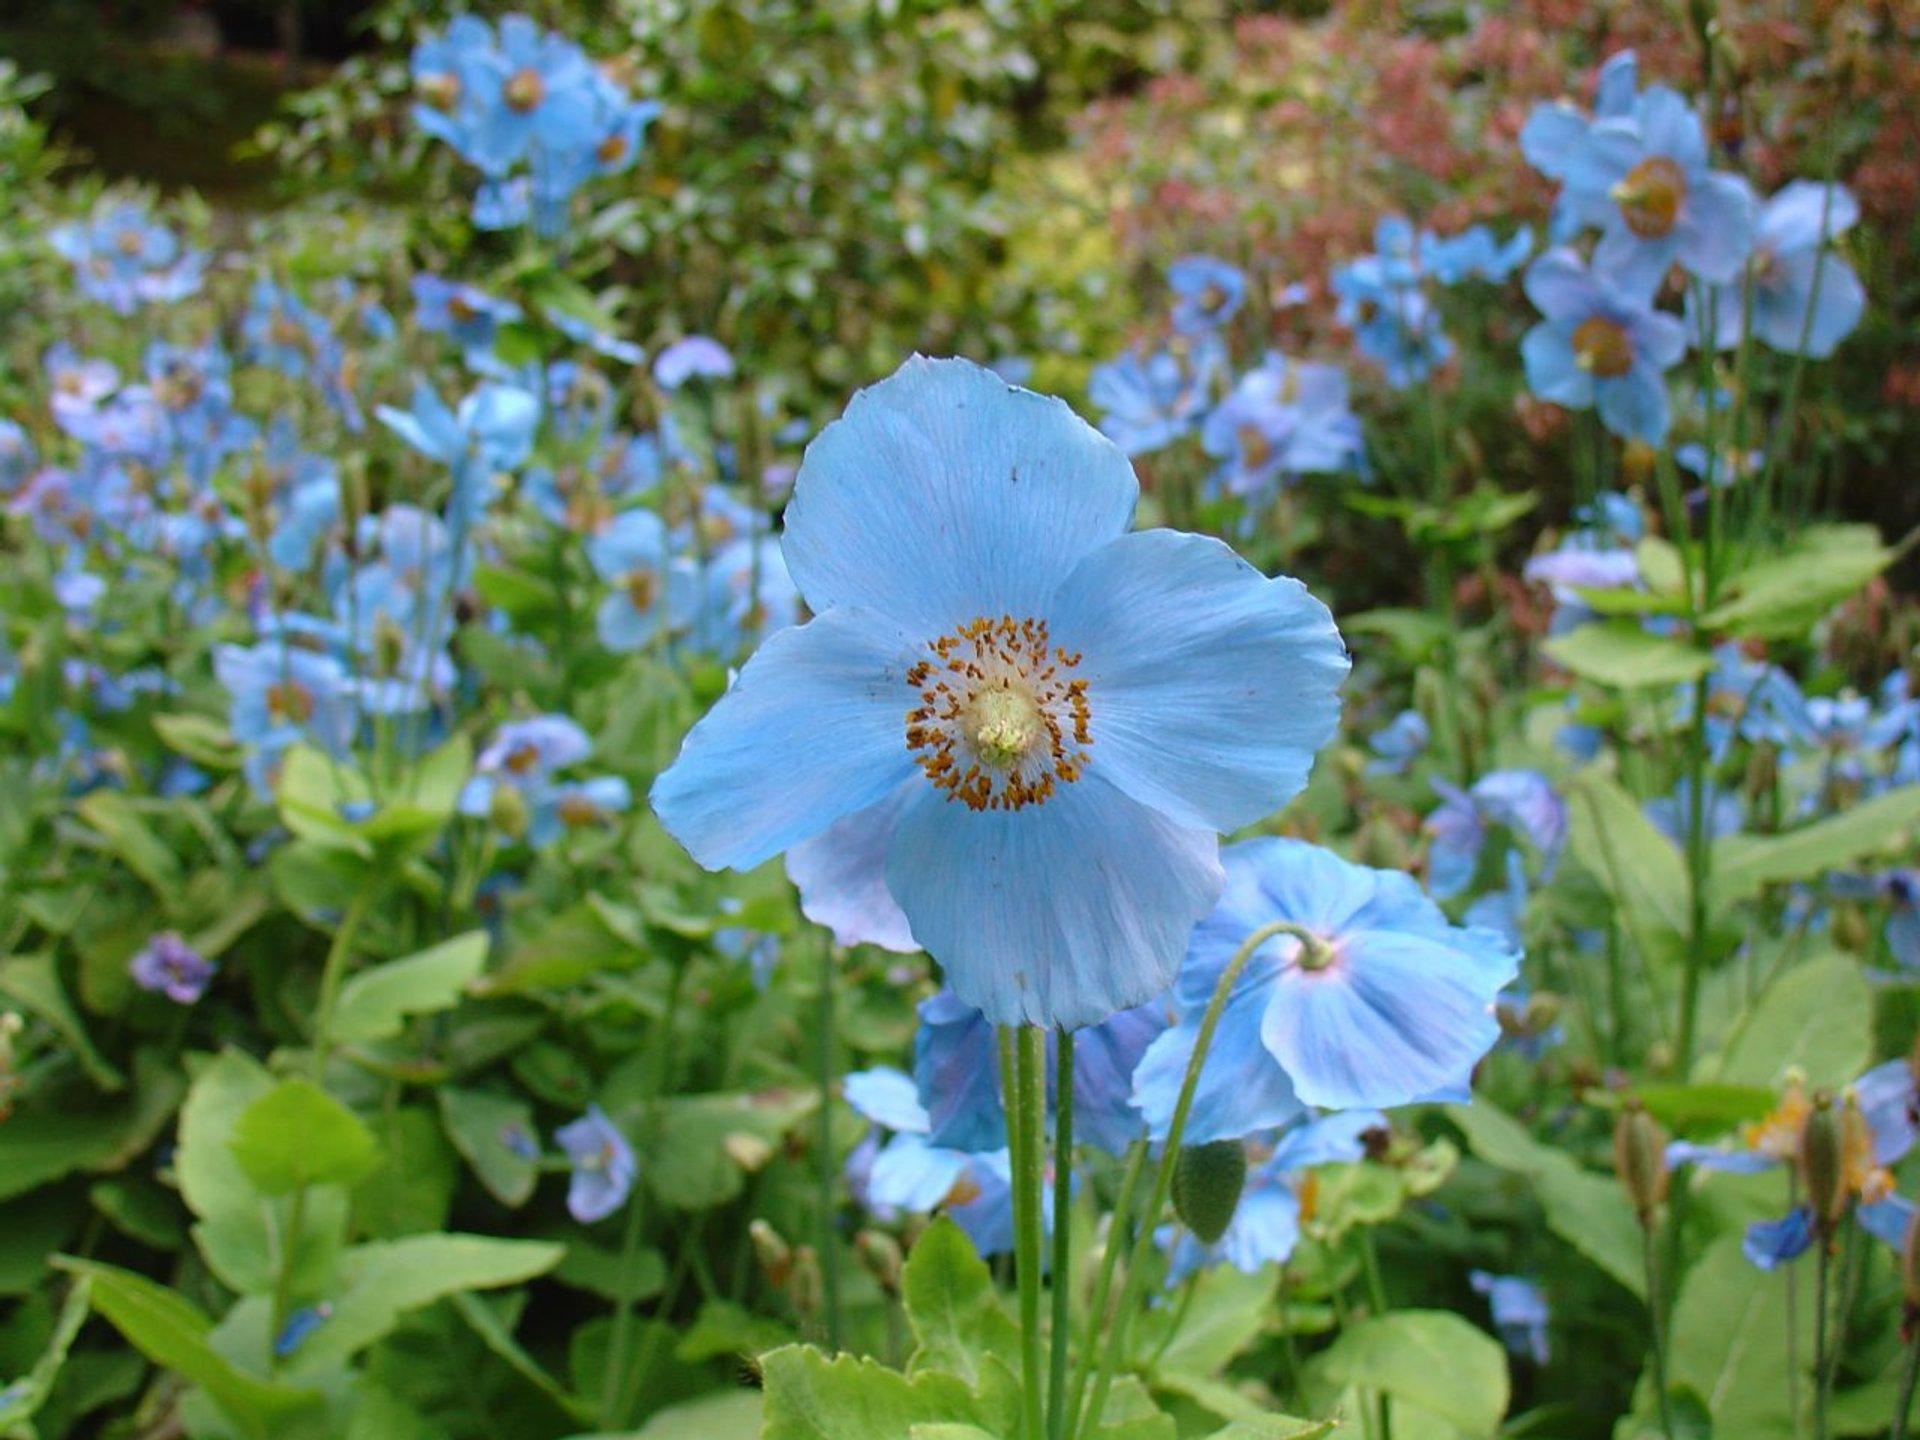 Himalayan Blue Poppy in Bhutan 2020 - Best Time